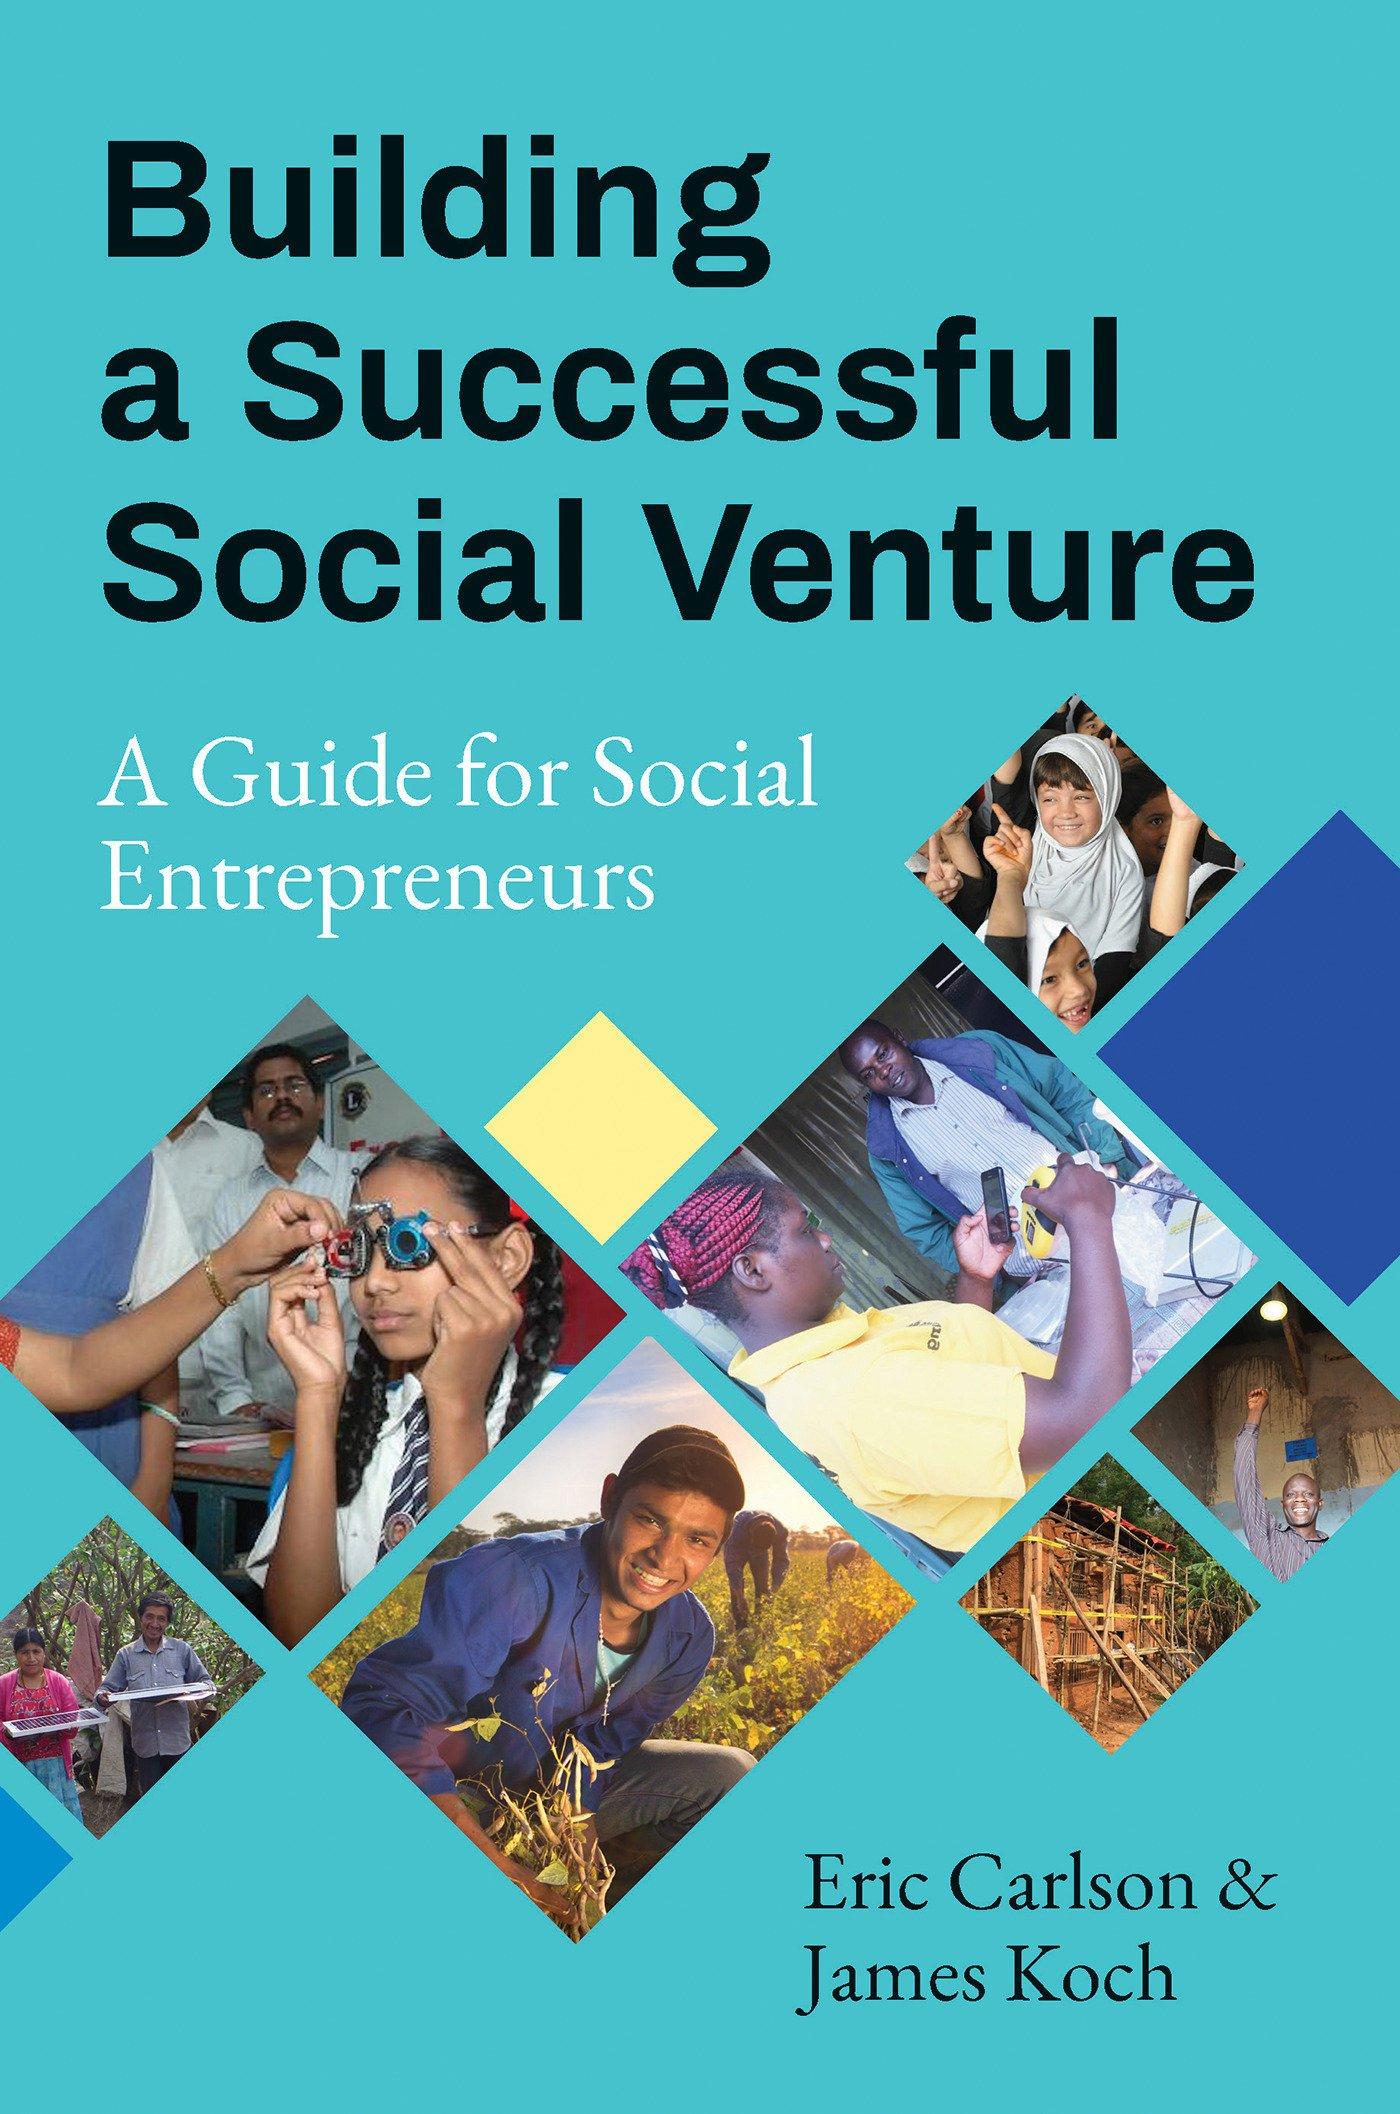 Building a Successful Social Venture: A Guide for Social Entrepreneurs